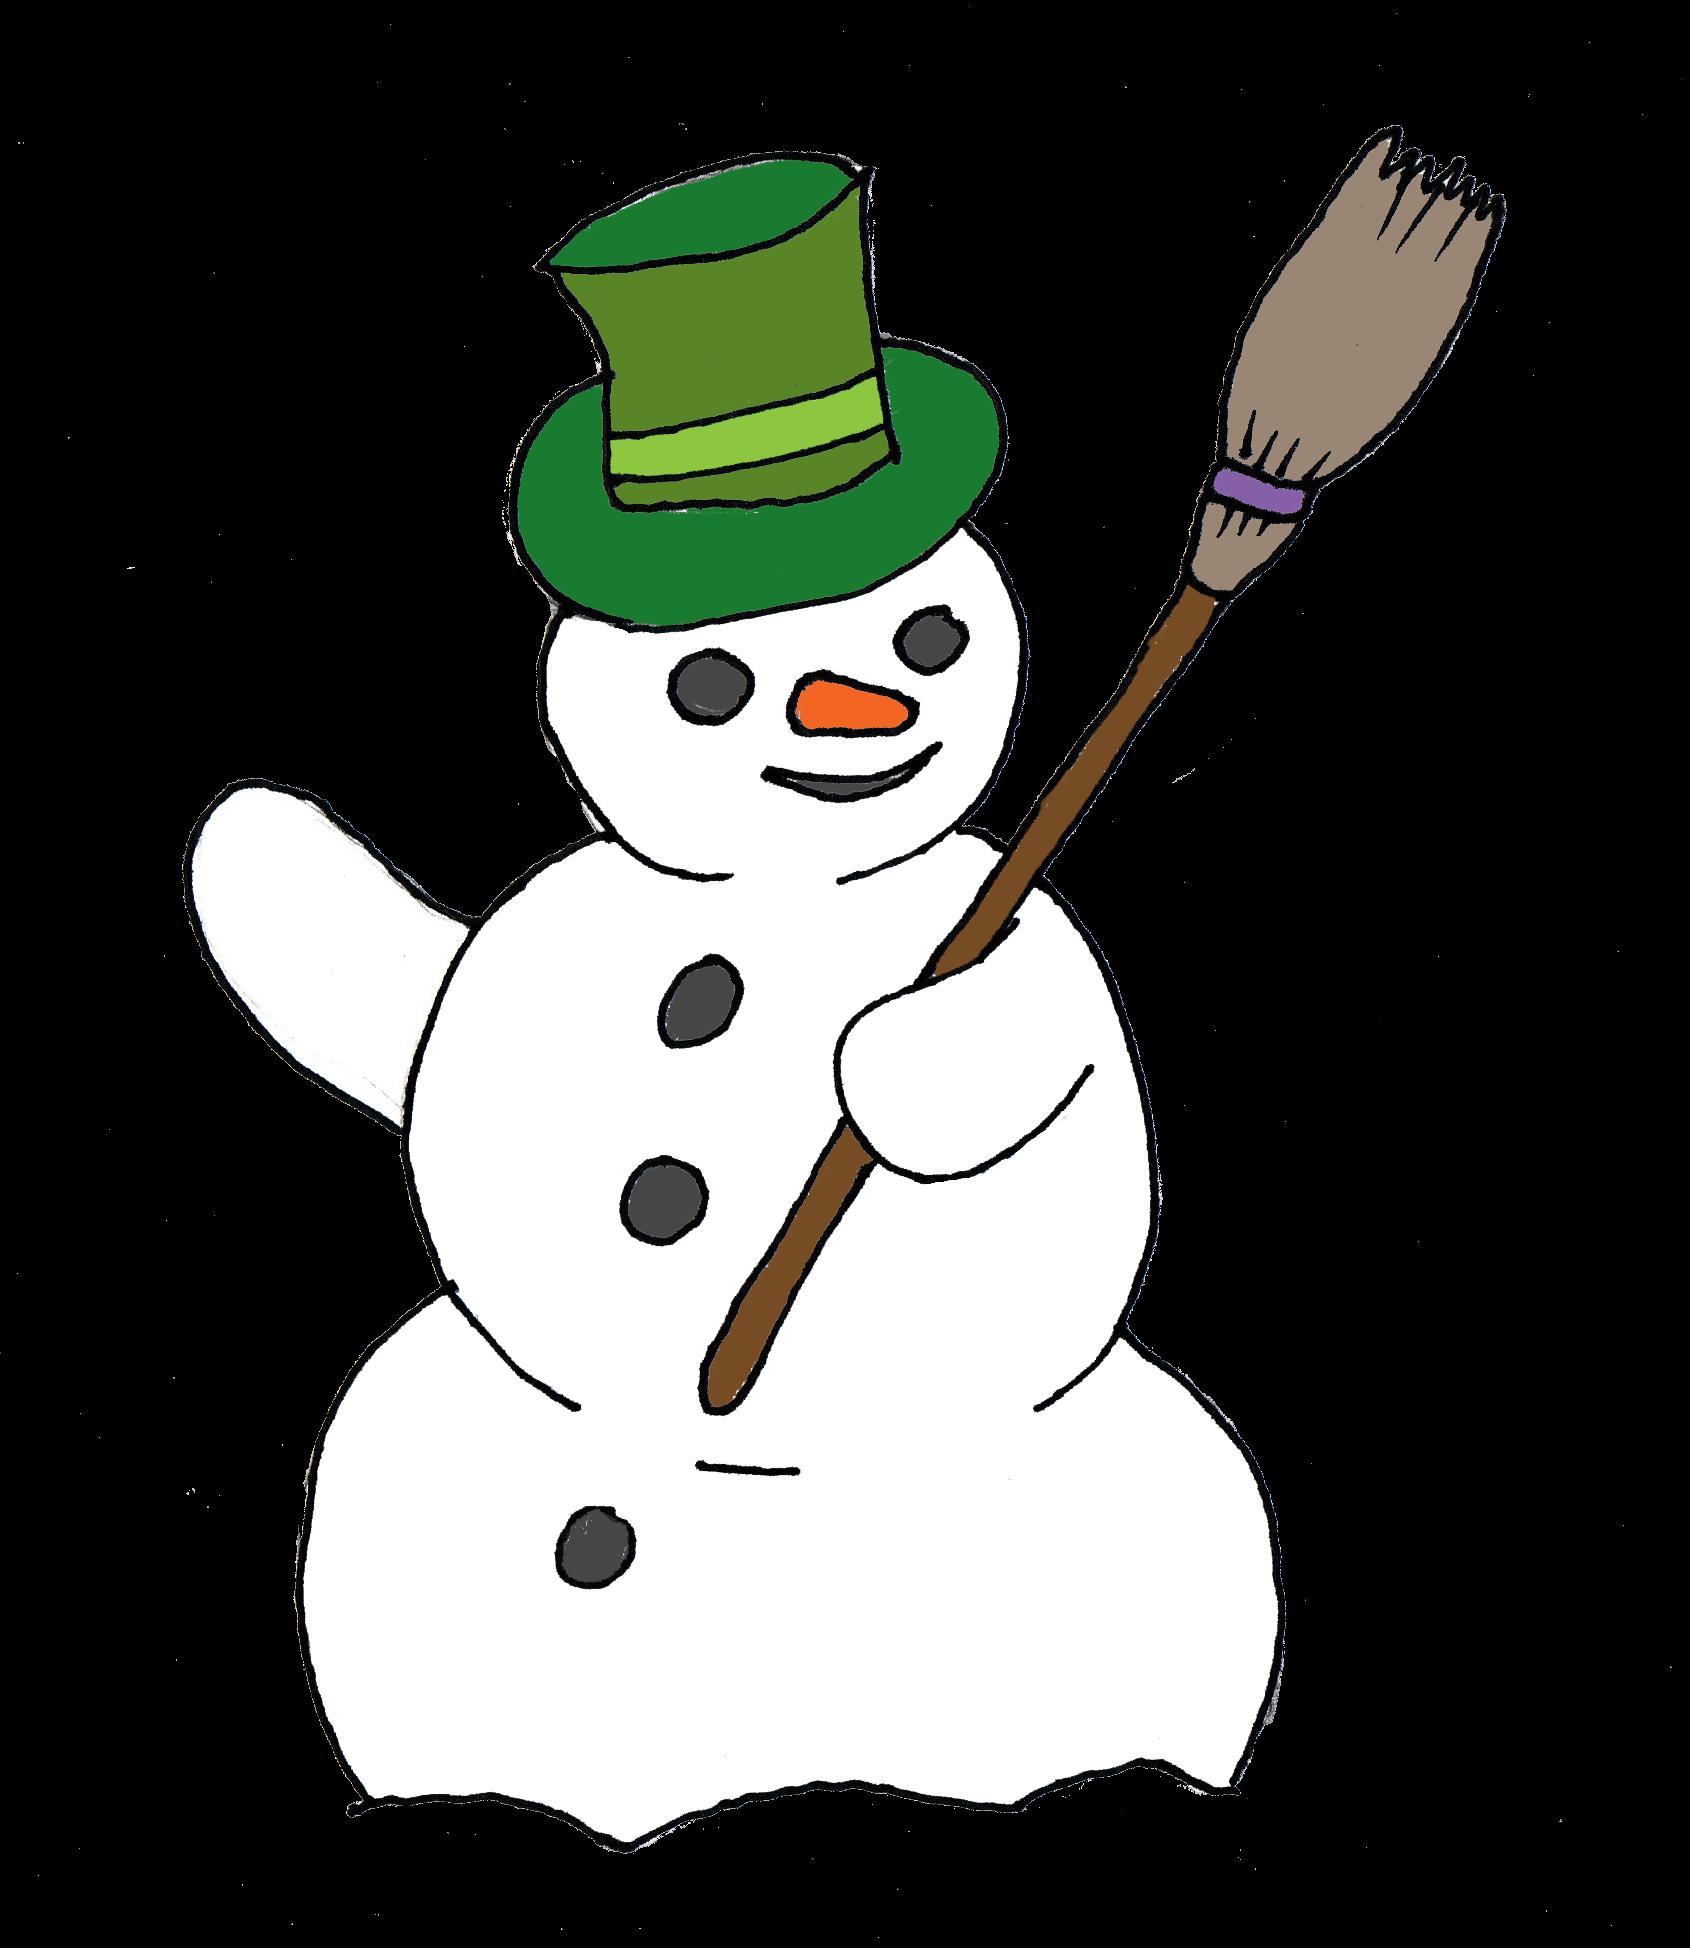 Free snowman border panda. Holiday clipart boarder